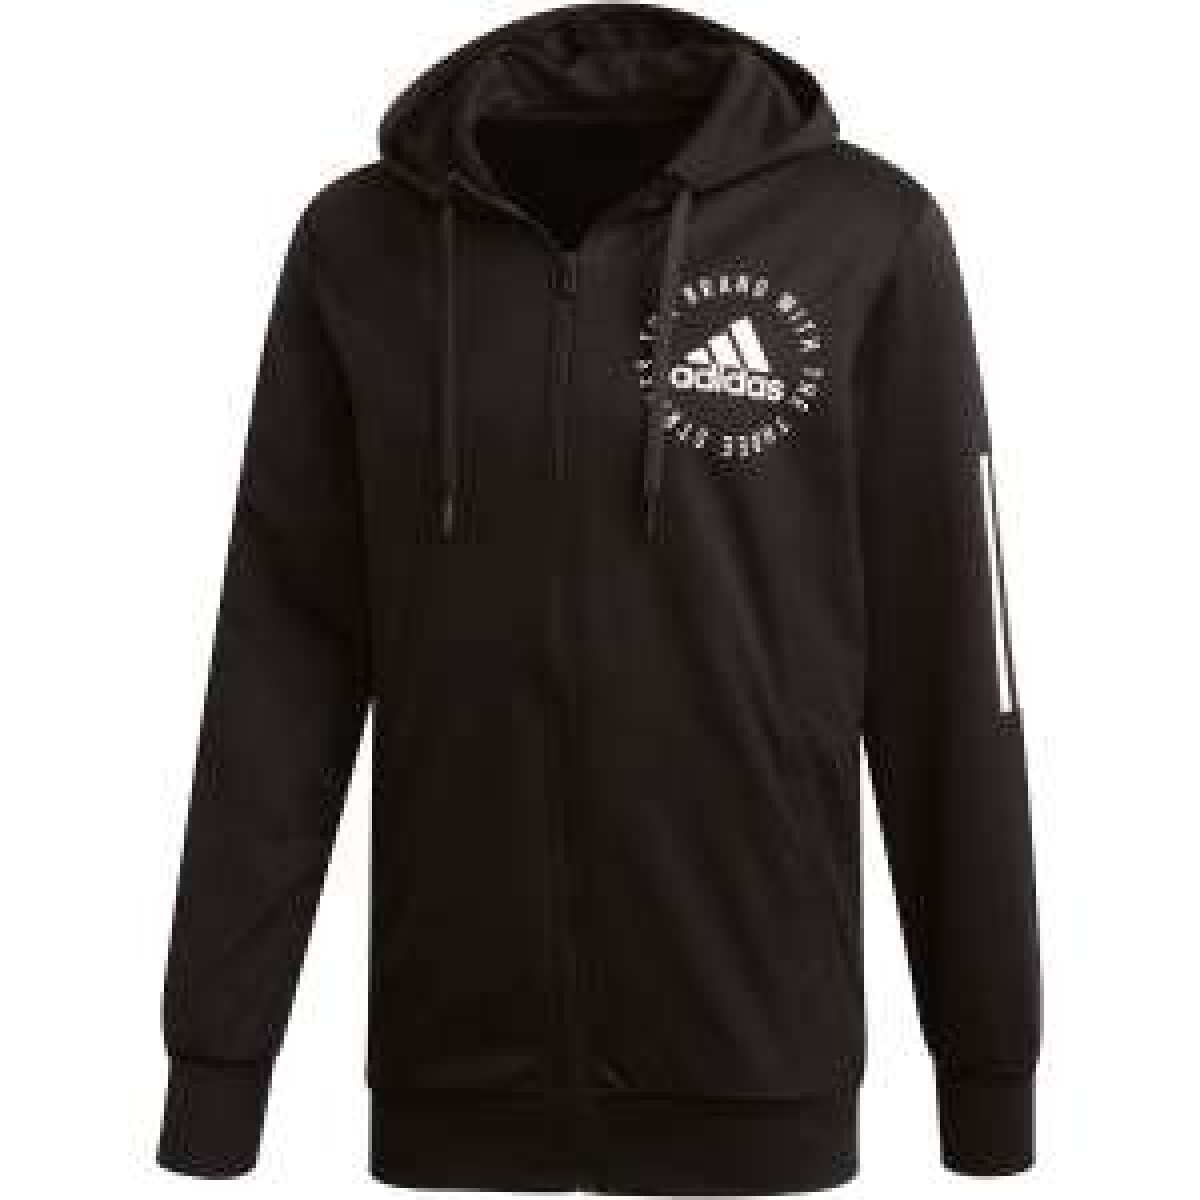 "Adidas™ - Herren Kapuzenjacke/Full-Zip Hoody ""Sport ID"" (Black) ab €19,15 [@Karstadt.de]"